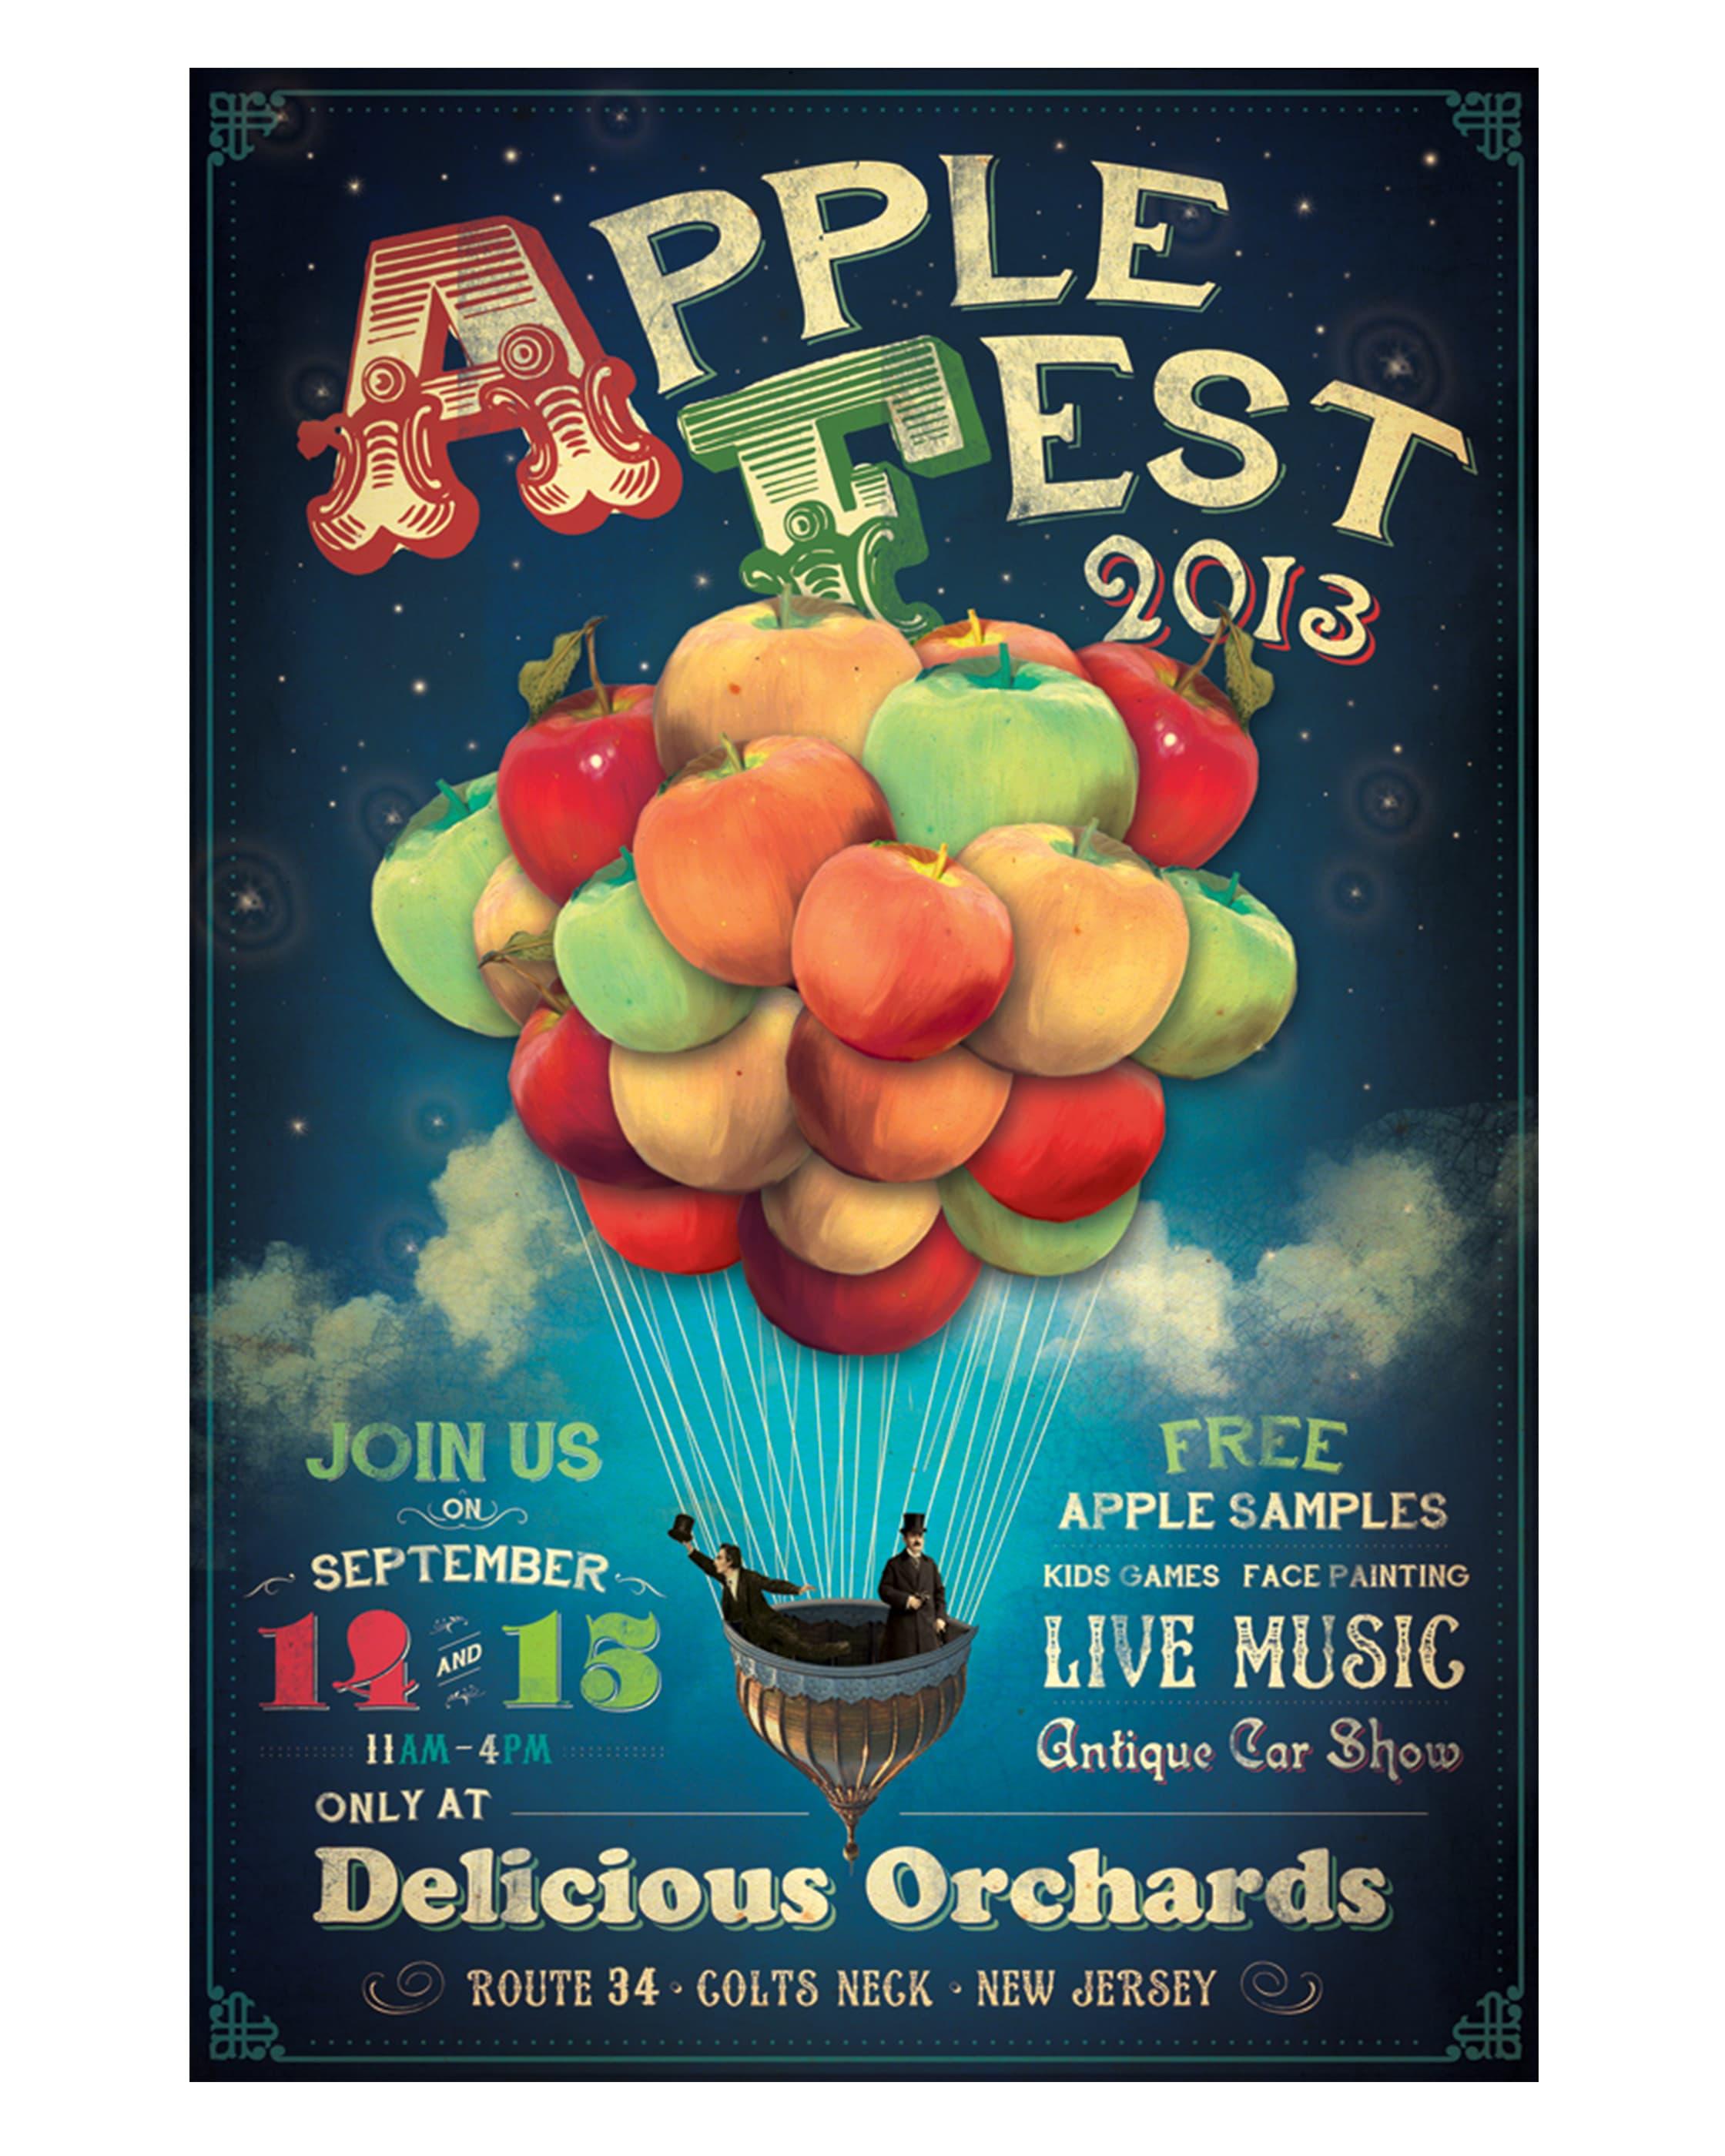 Applefest Poster 2013